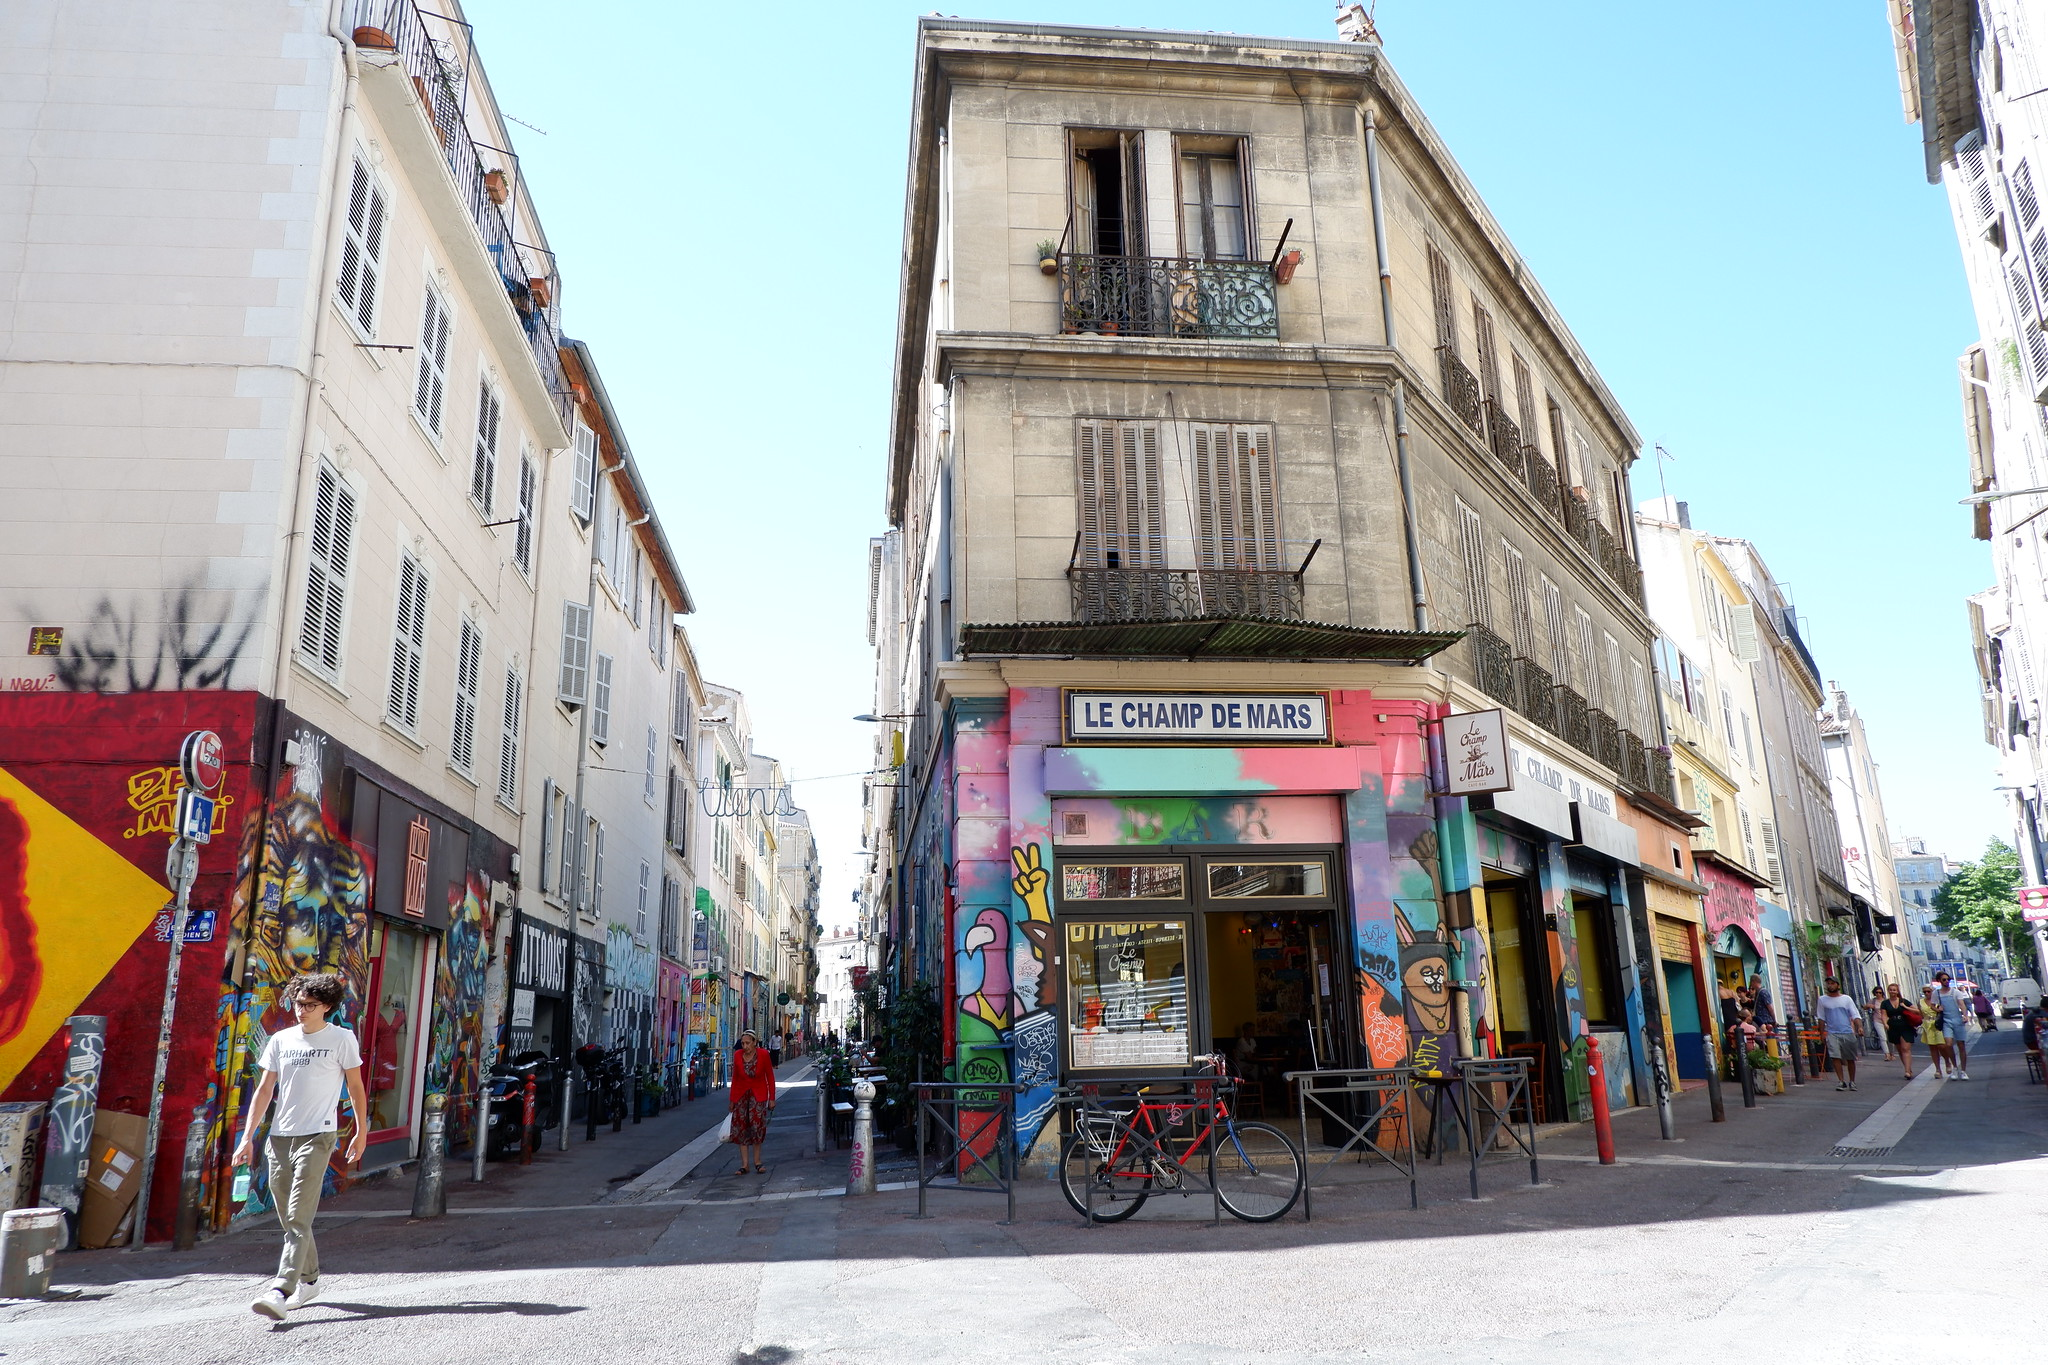 A colourful street block on Marseille's La Plaine.